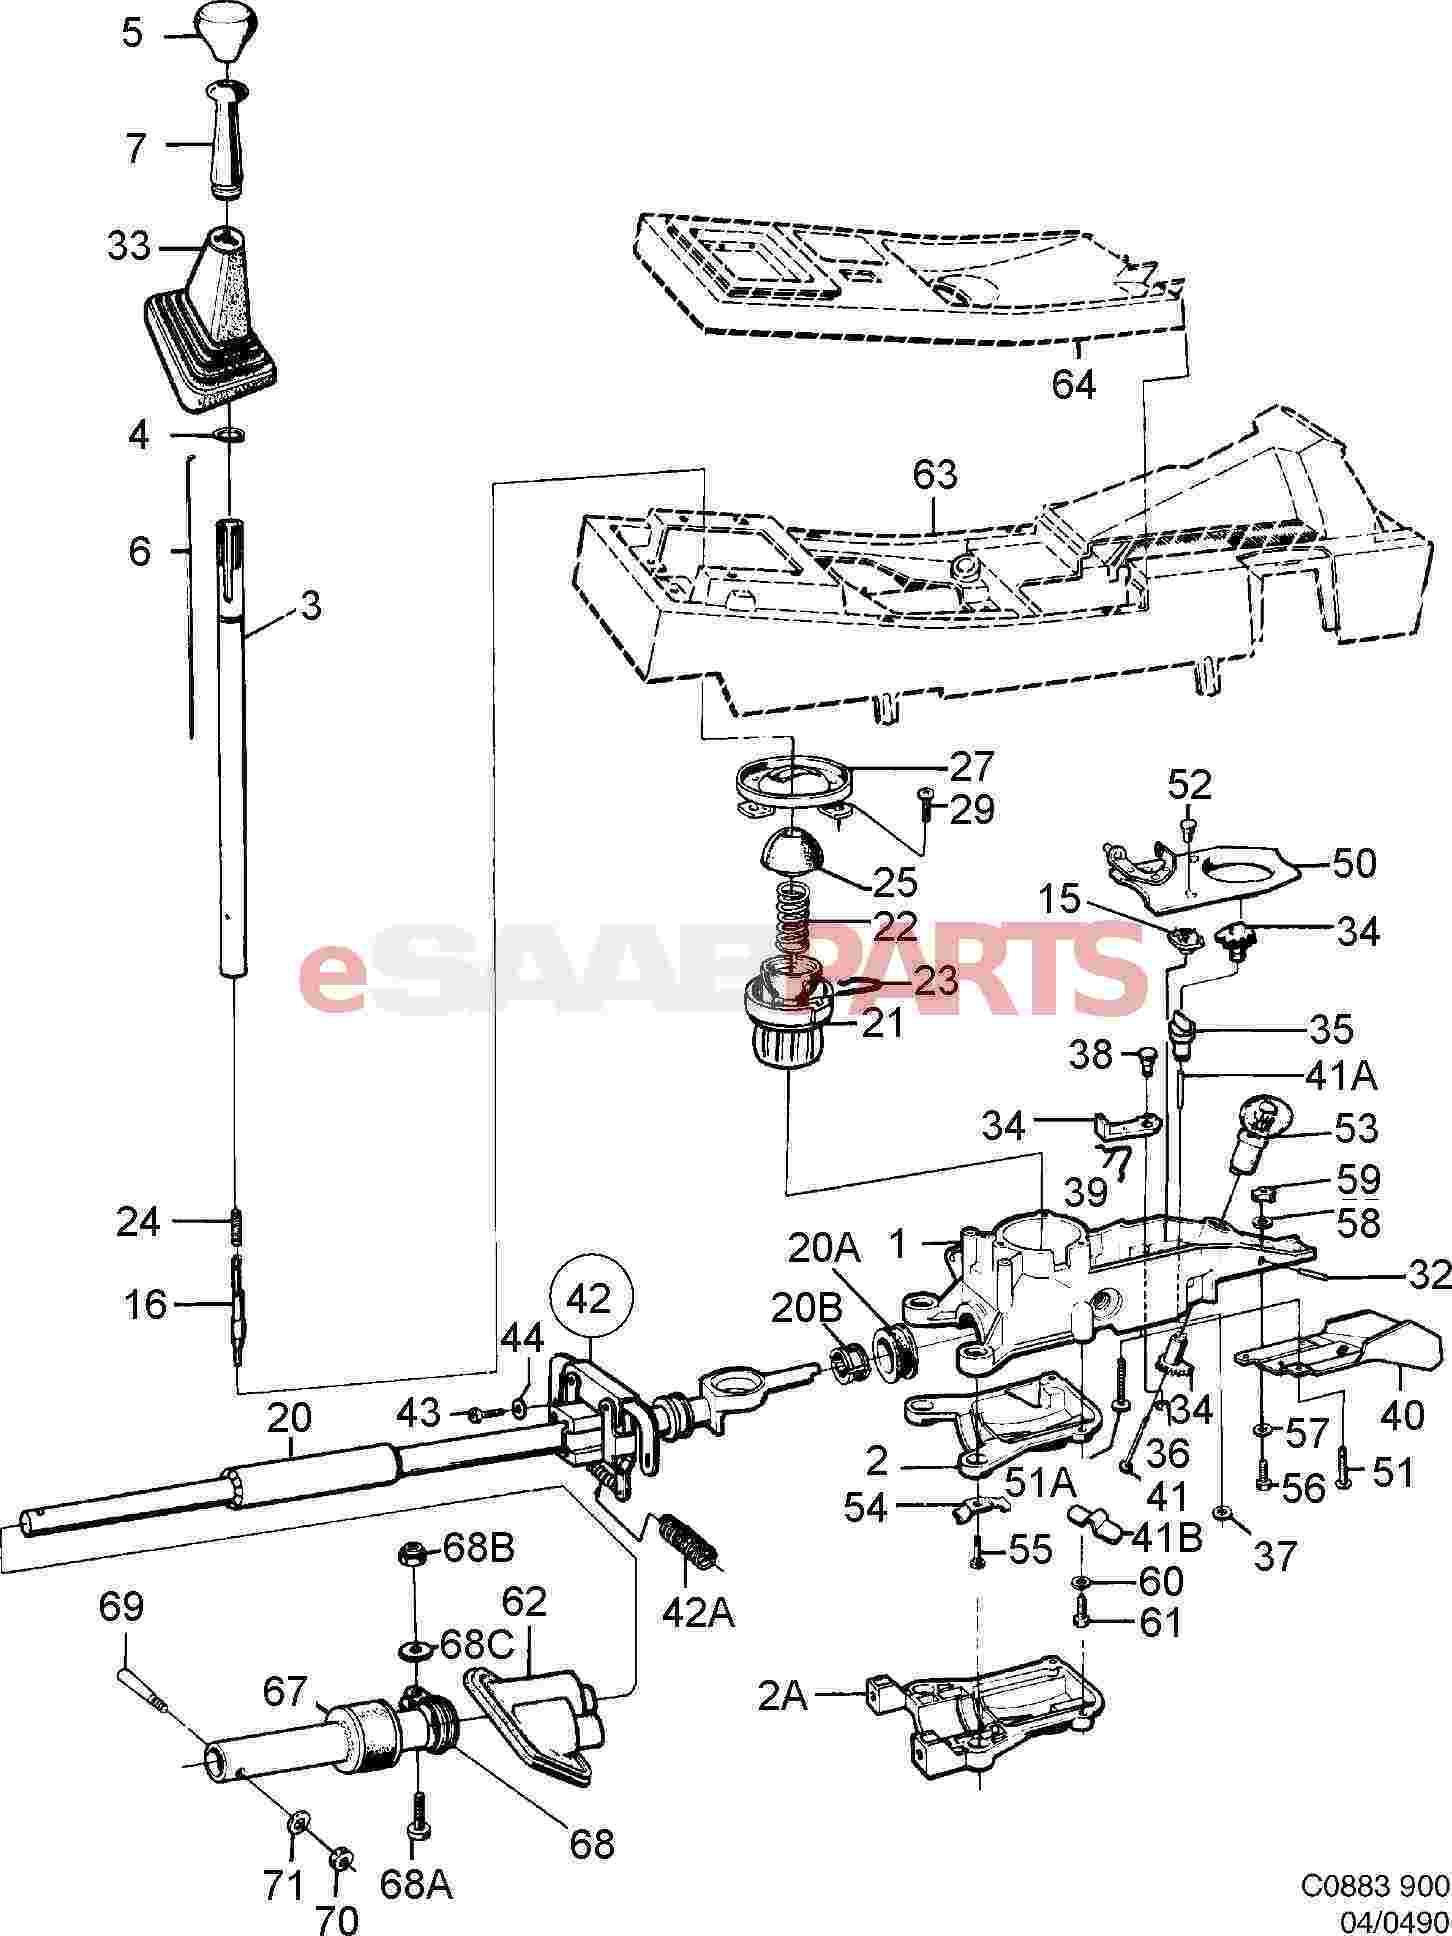 Eaton 11 Hydrostatic Part Numbers | Wiring Diagram Database